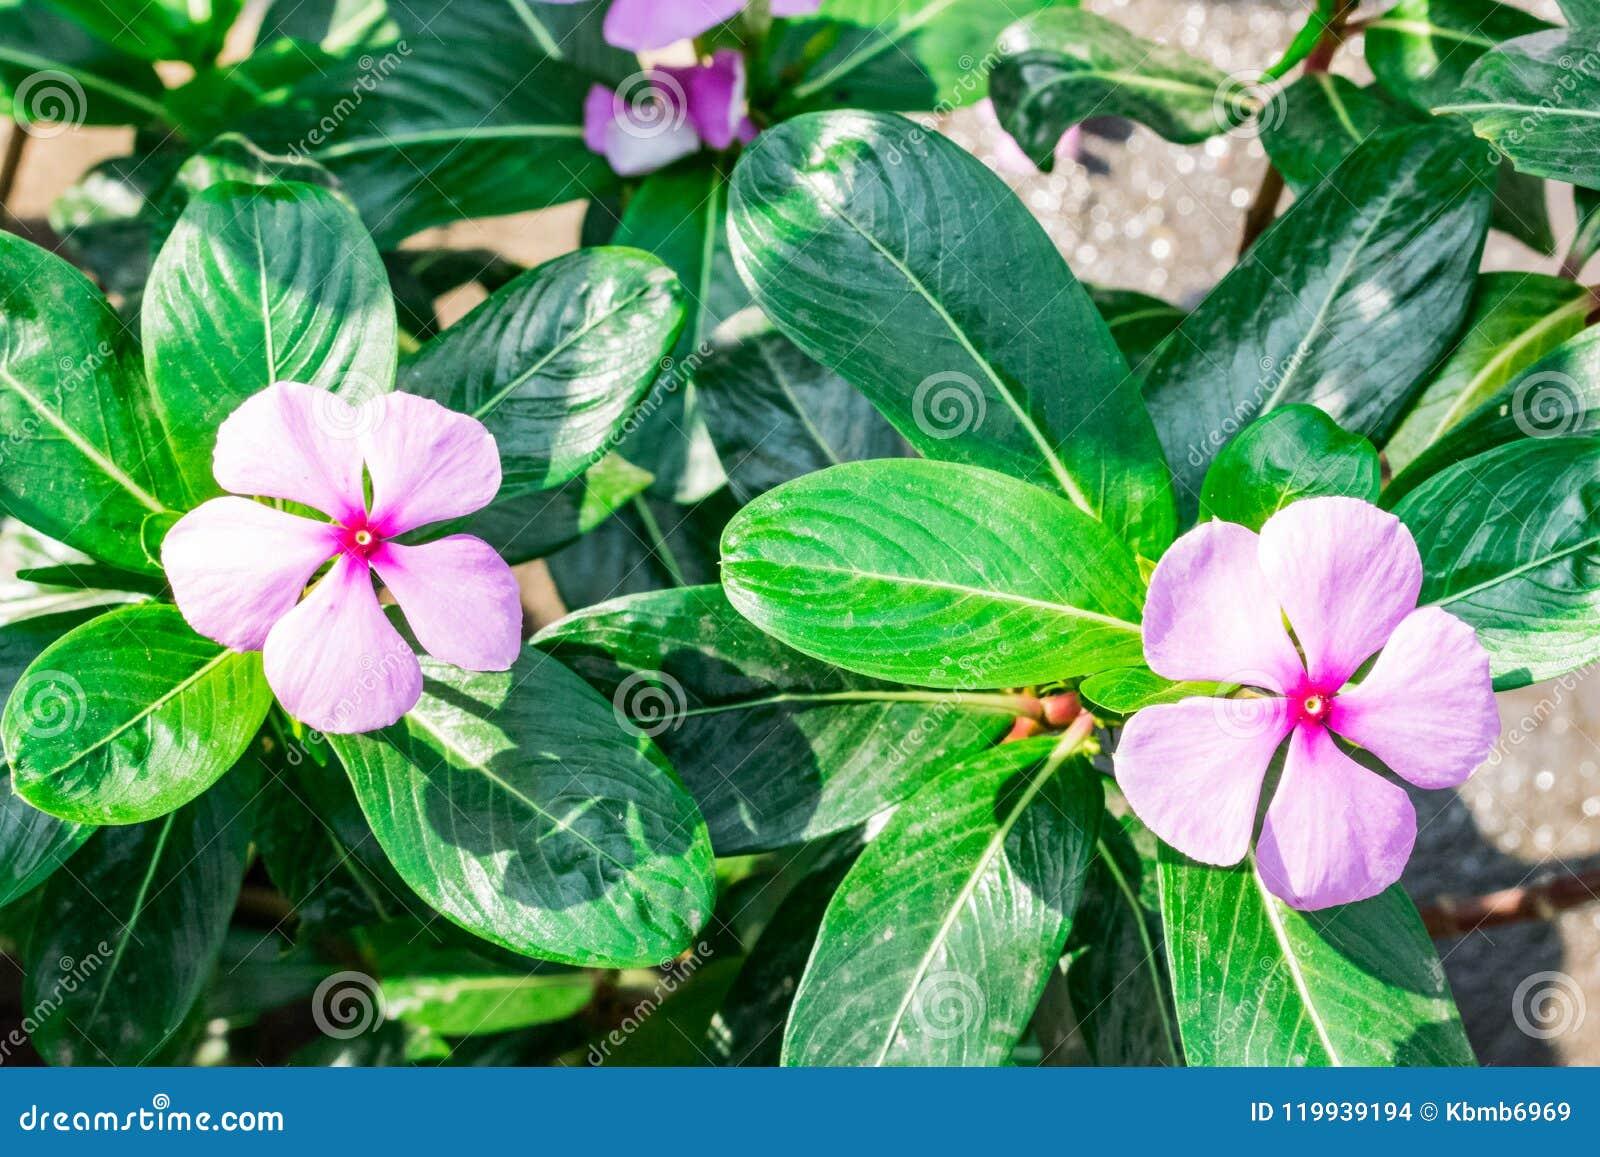 madagascar Periwinkle Hot Five Petal Flower Five Petals ...